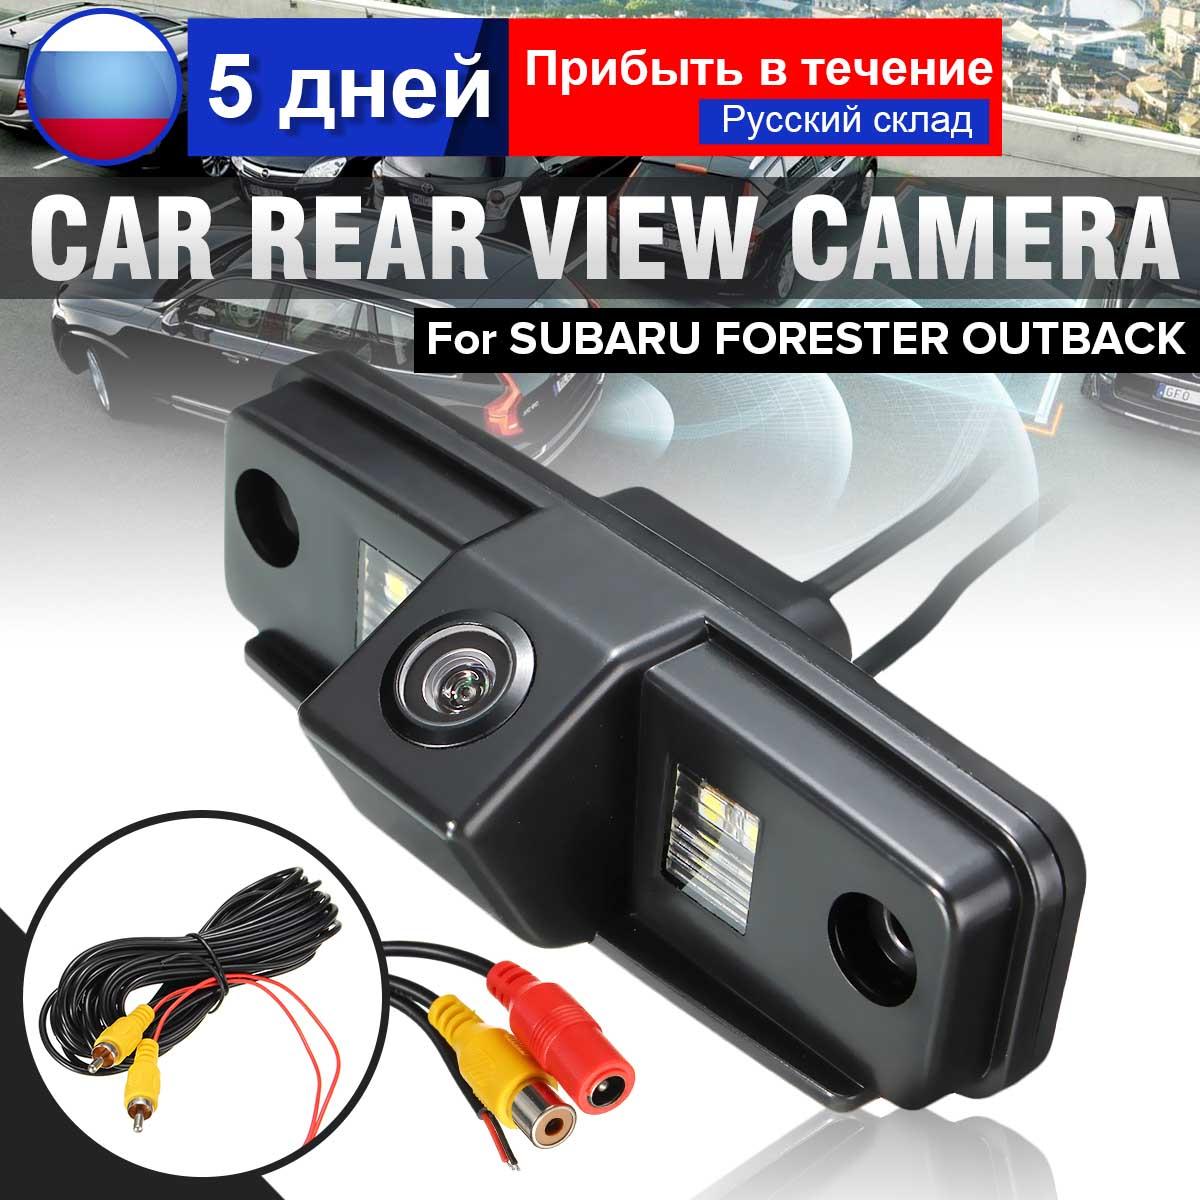 CCD Car Rear View Camera Parking Reverse Cameras Backup For Subaru Forester Impreza Outback Sedan Tribeca 2007-12